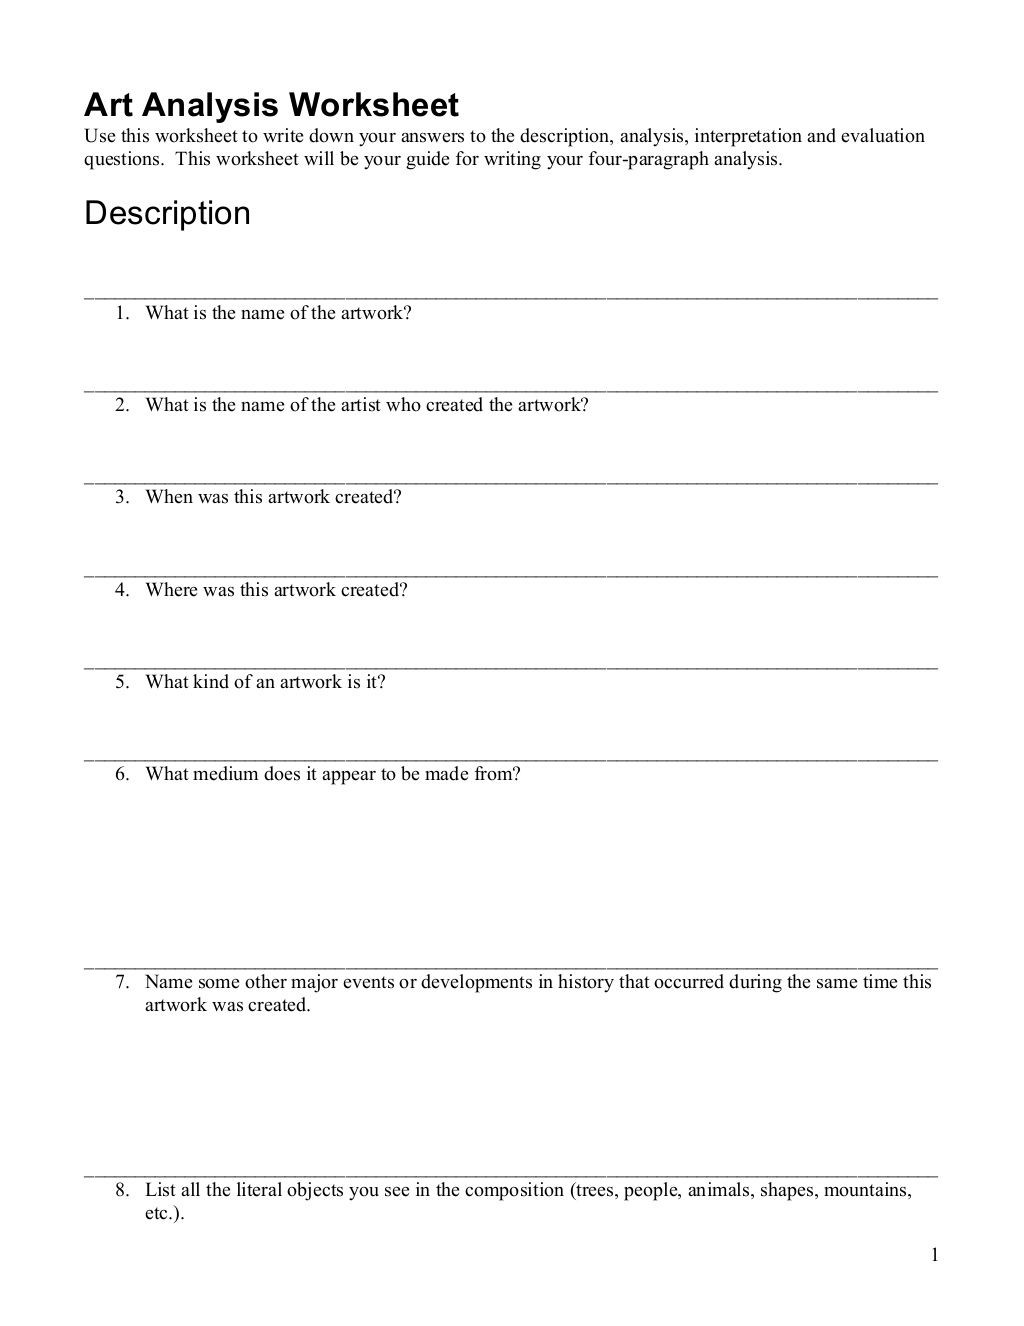 Written Document Analysis Worksheet Answers Artwork Analysis Worksheet by Colin Duff Via Slideshare